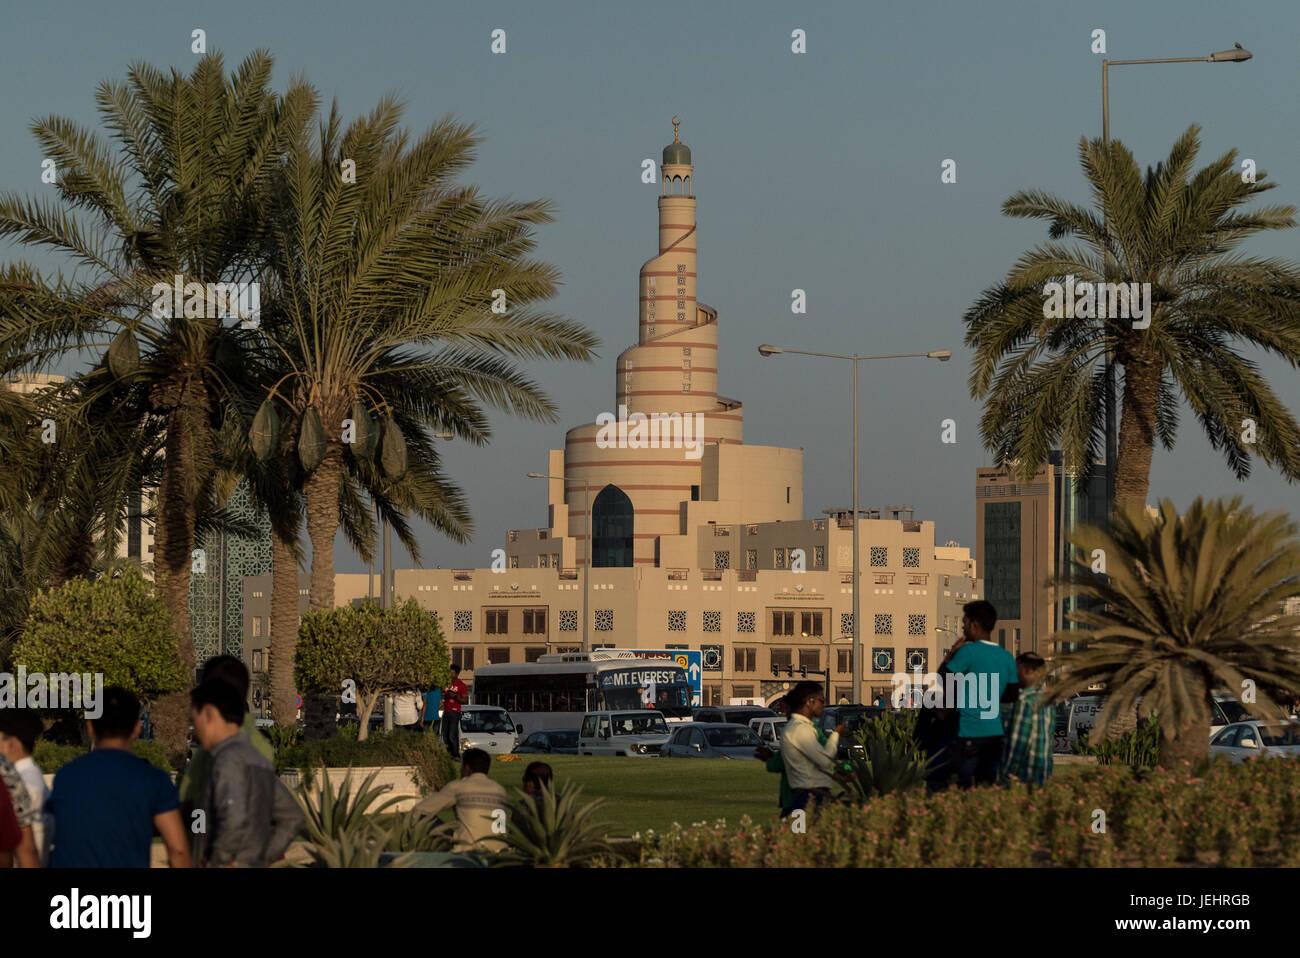 Sheikh Abdulla Bin Zaid Al Mahmoud Islamic Cultural Center is a Qatari state initiative, created with a vision to - Stock Image